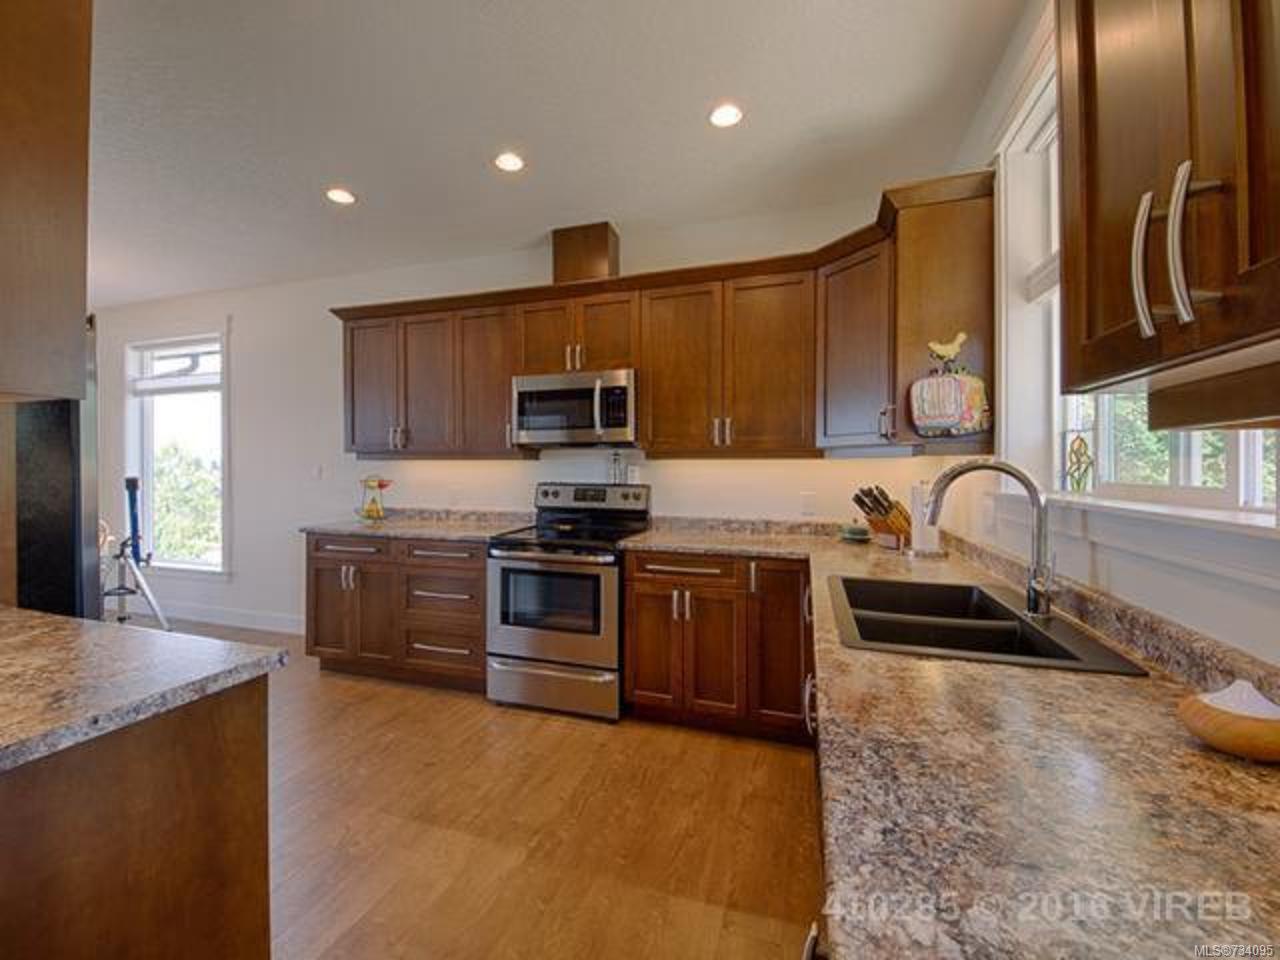 Photo 6: Photos: 189 Strathcona Way Campbell River Real Estate Properties British Columbia Remax Check Realty